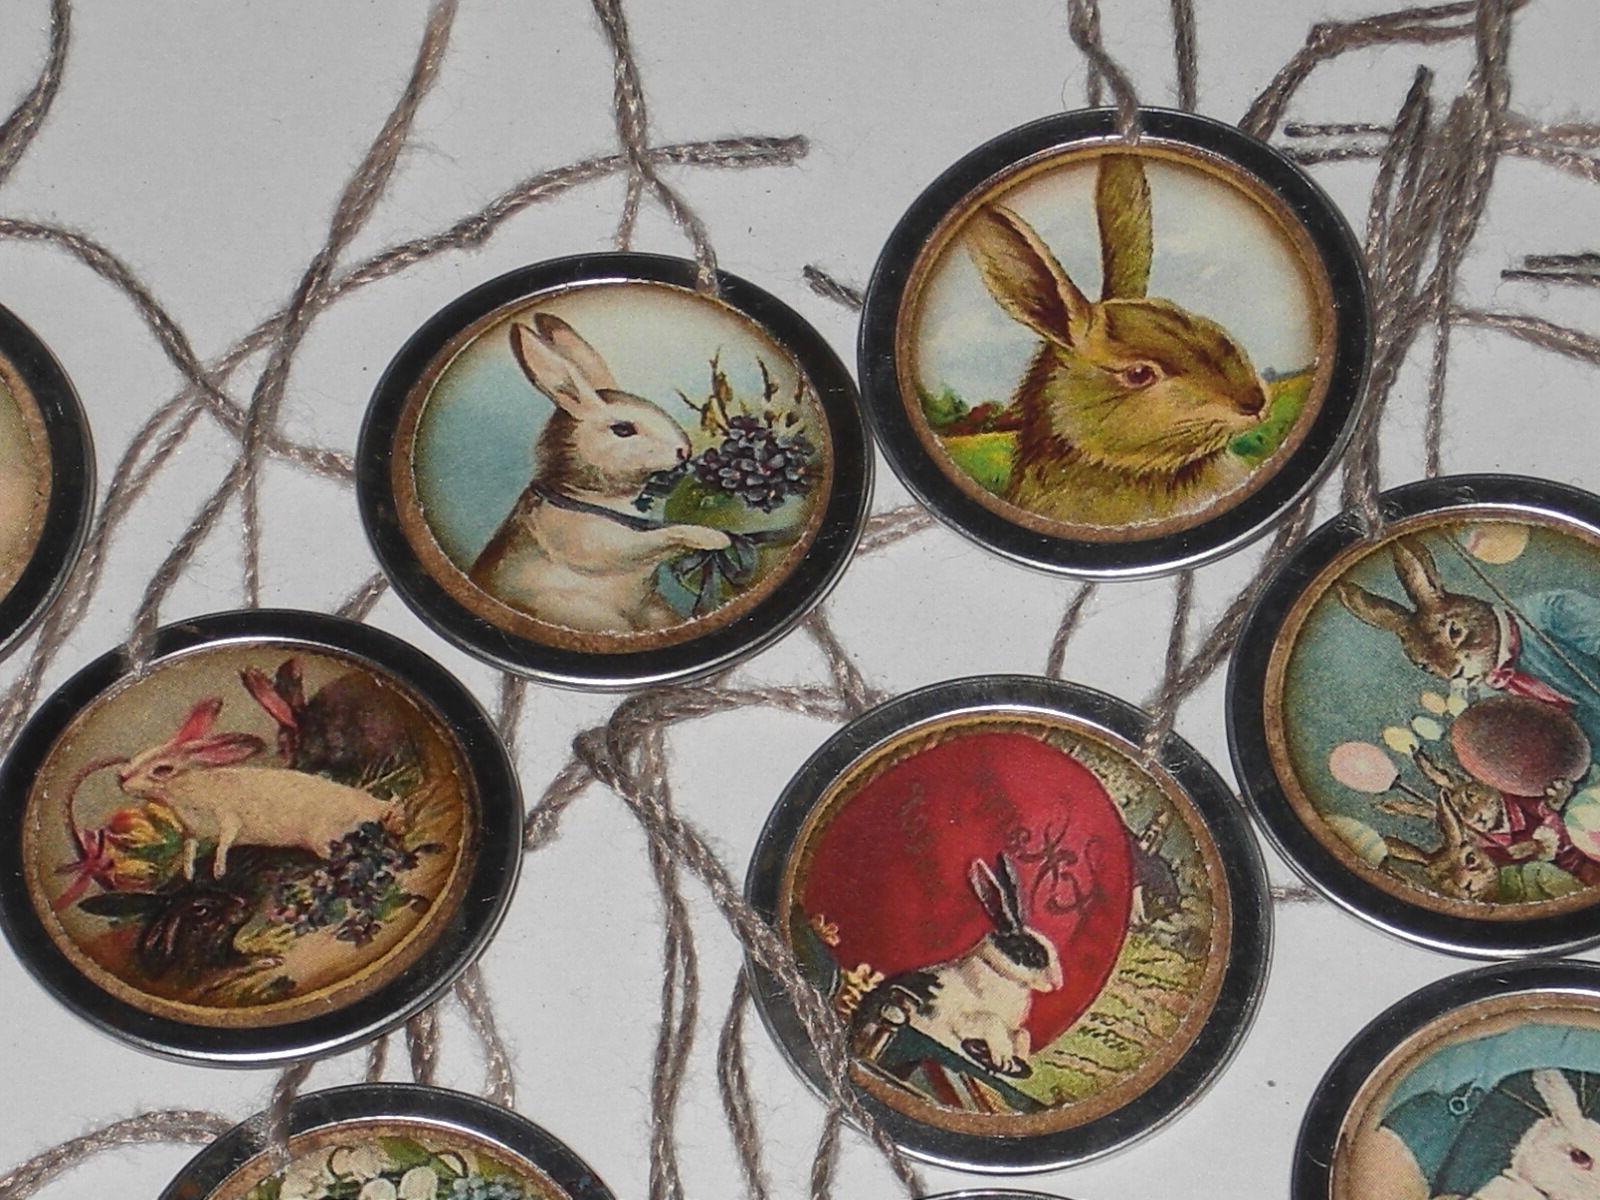 10 Easter Bunny Hang Tags Mini Tree Ornaments